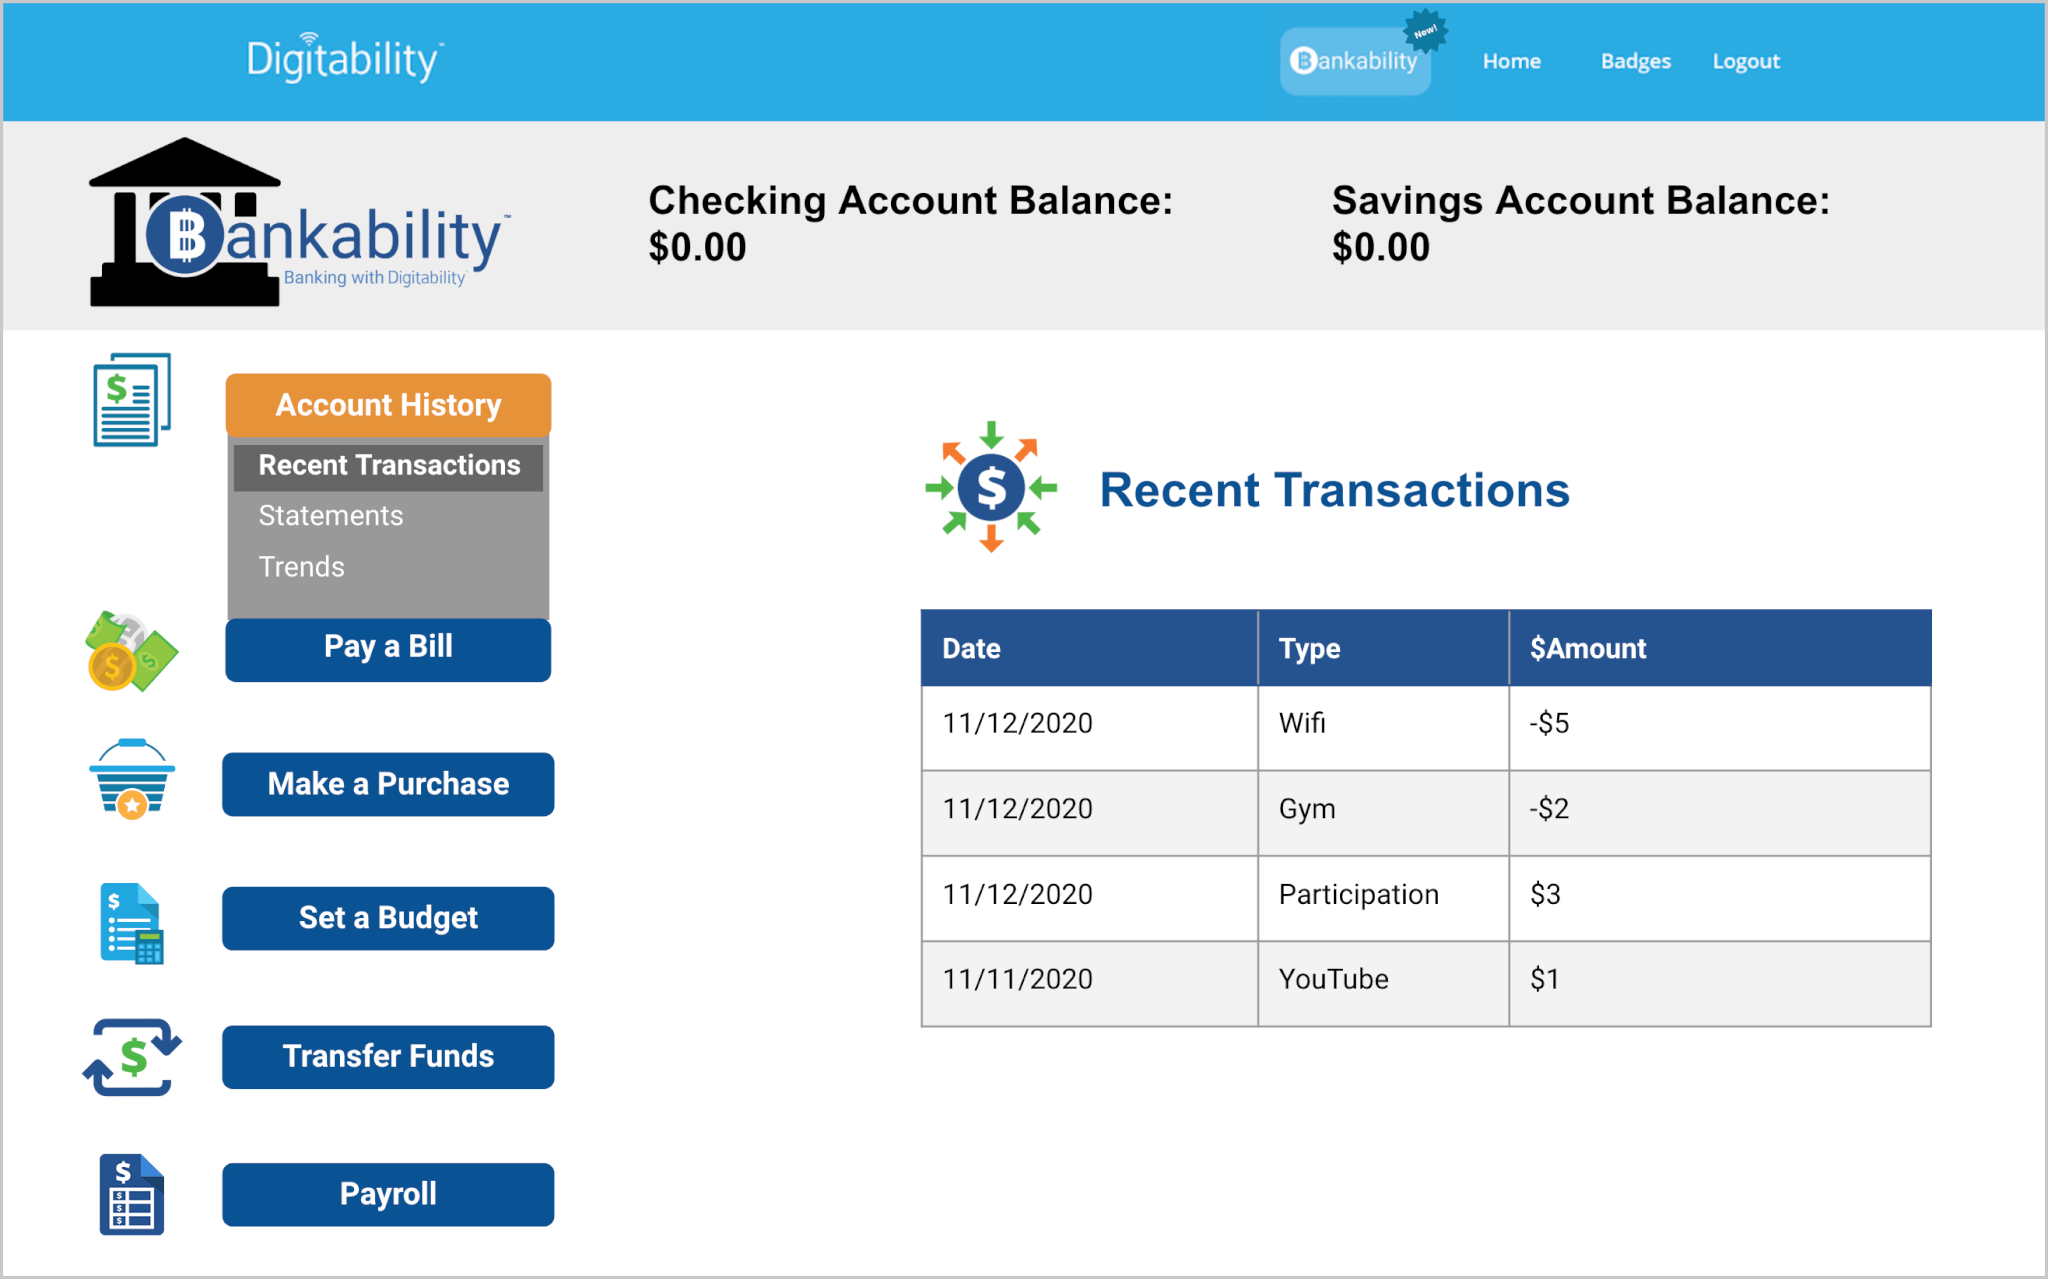 2 Bankability Account History